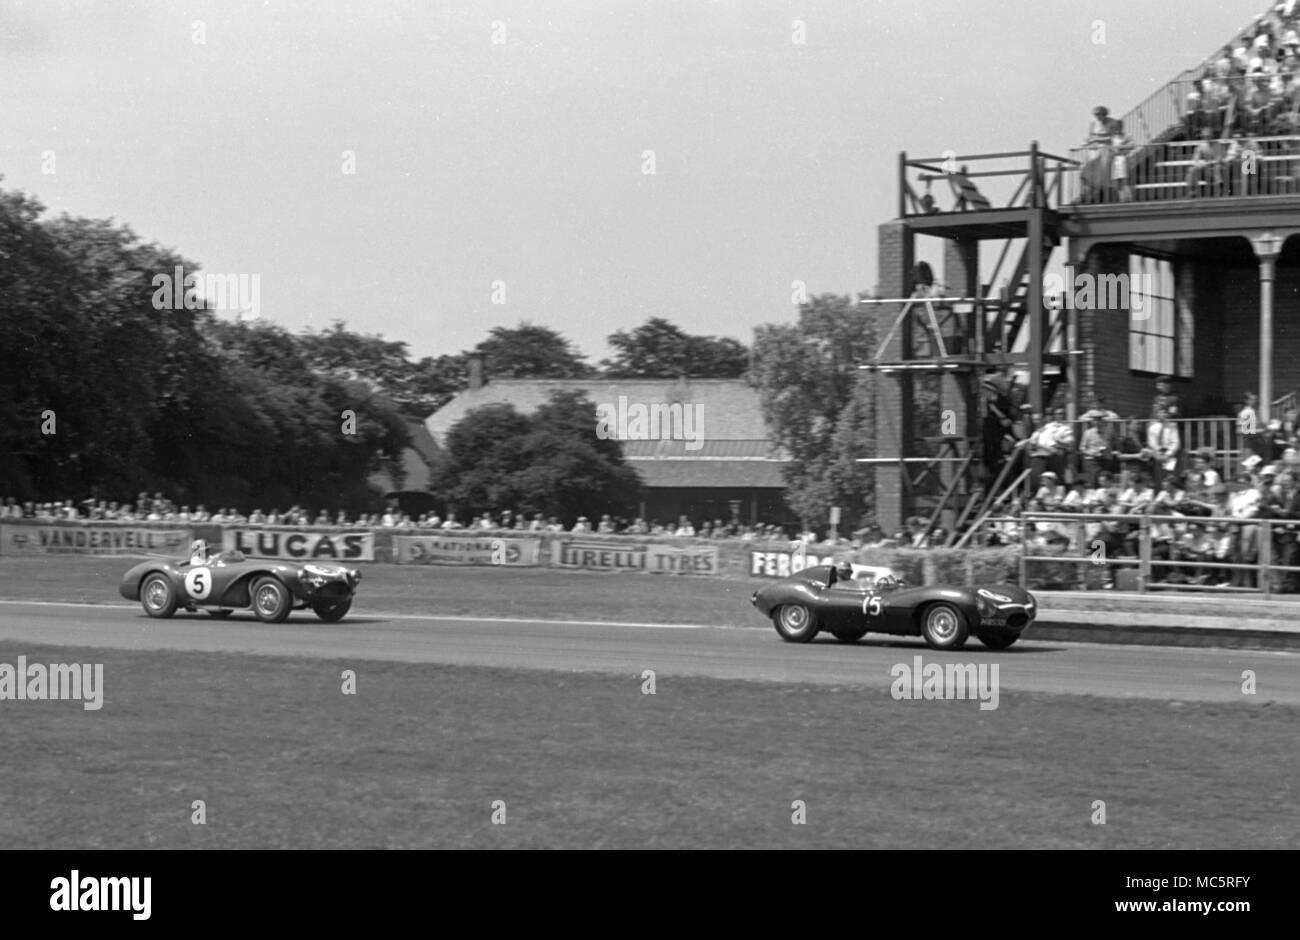 Aston Martin DB 3 S REg Parnell, Aintree 16/07/1955 Stockbild